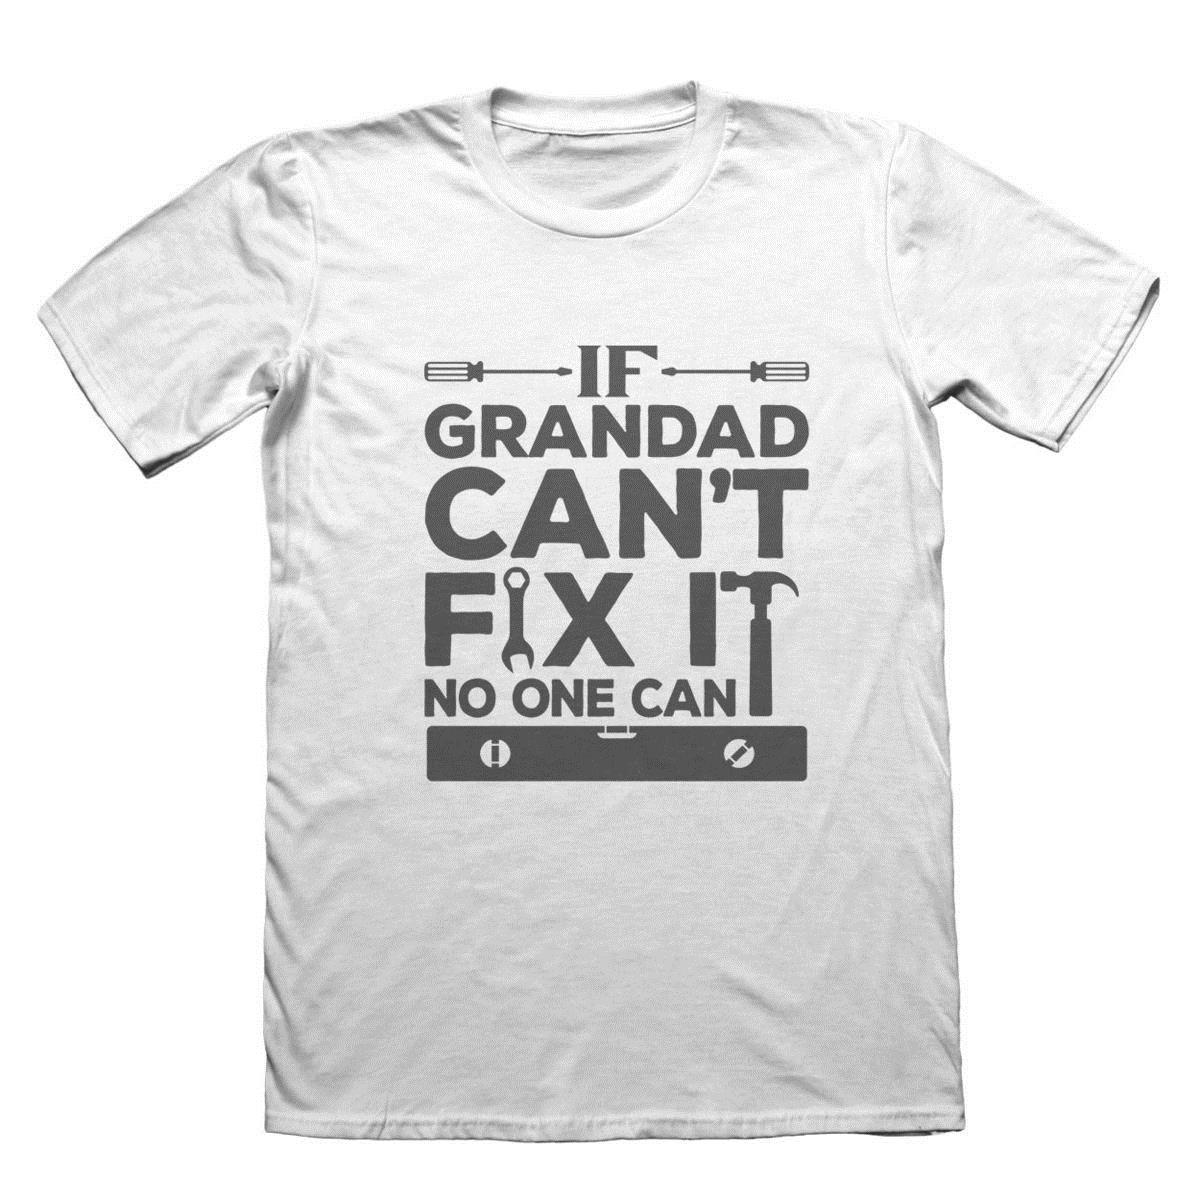 d4896e864 If Grandad Can't Fix It T-Shirt - Grandpa Granddad Funny Gift Top Cool Funny  T-Shirt Men High Quality Tees Tops Male T Shirt Men